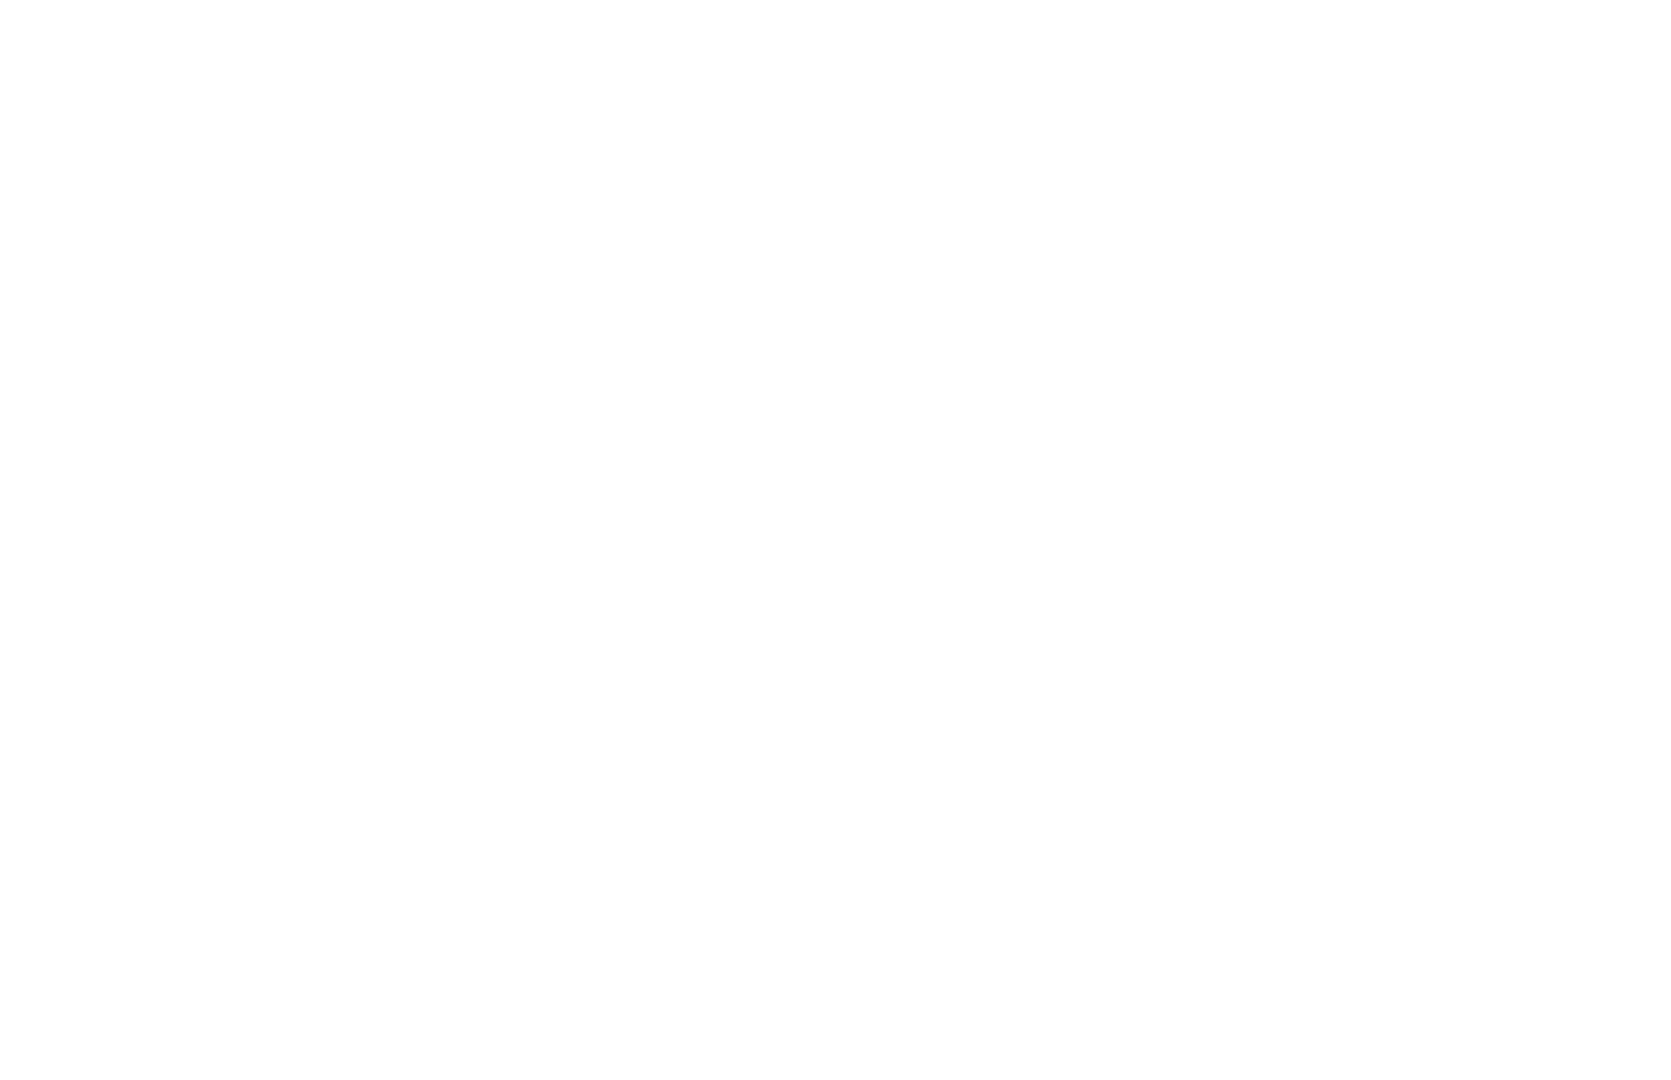 RNS TRIPMASTER GFX v2 pro